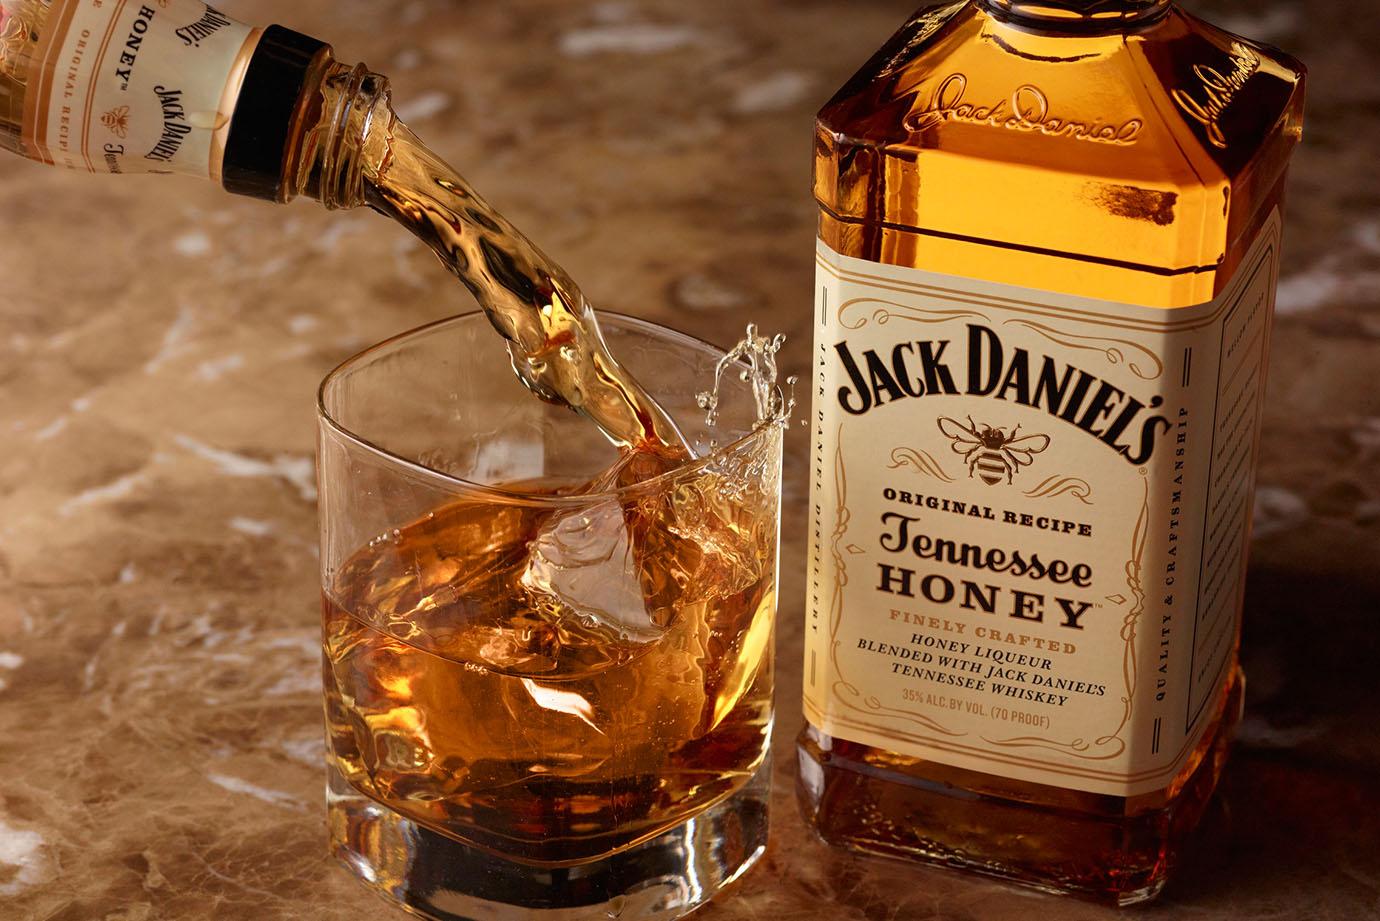 Jack Daniels #2